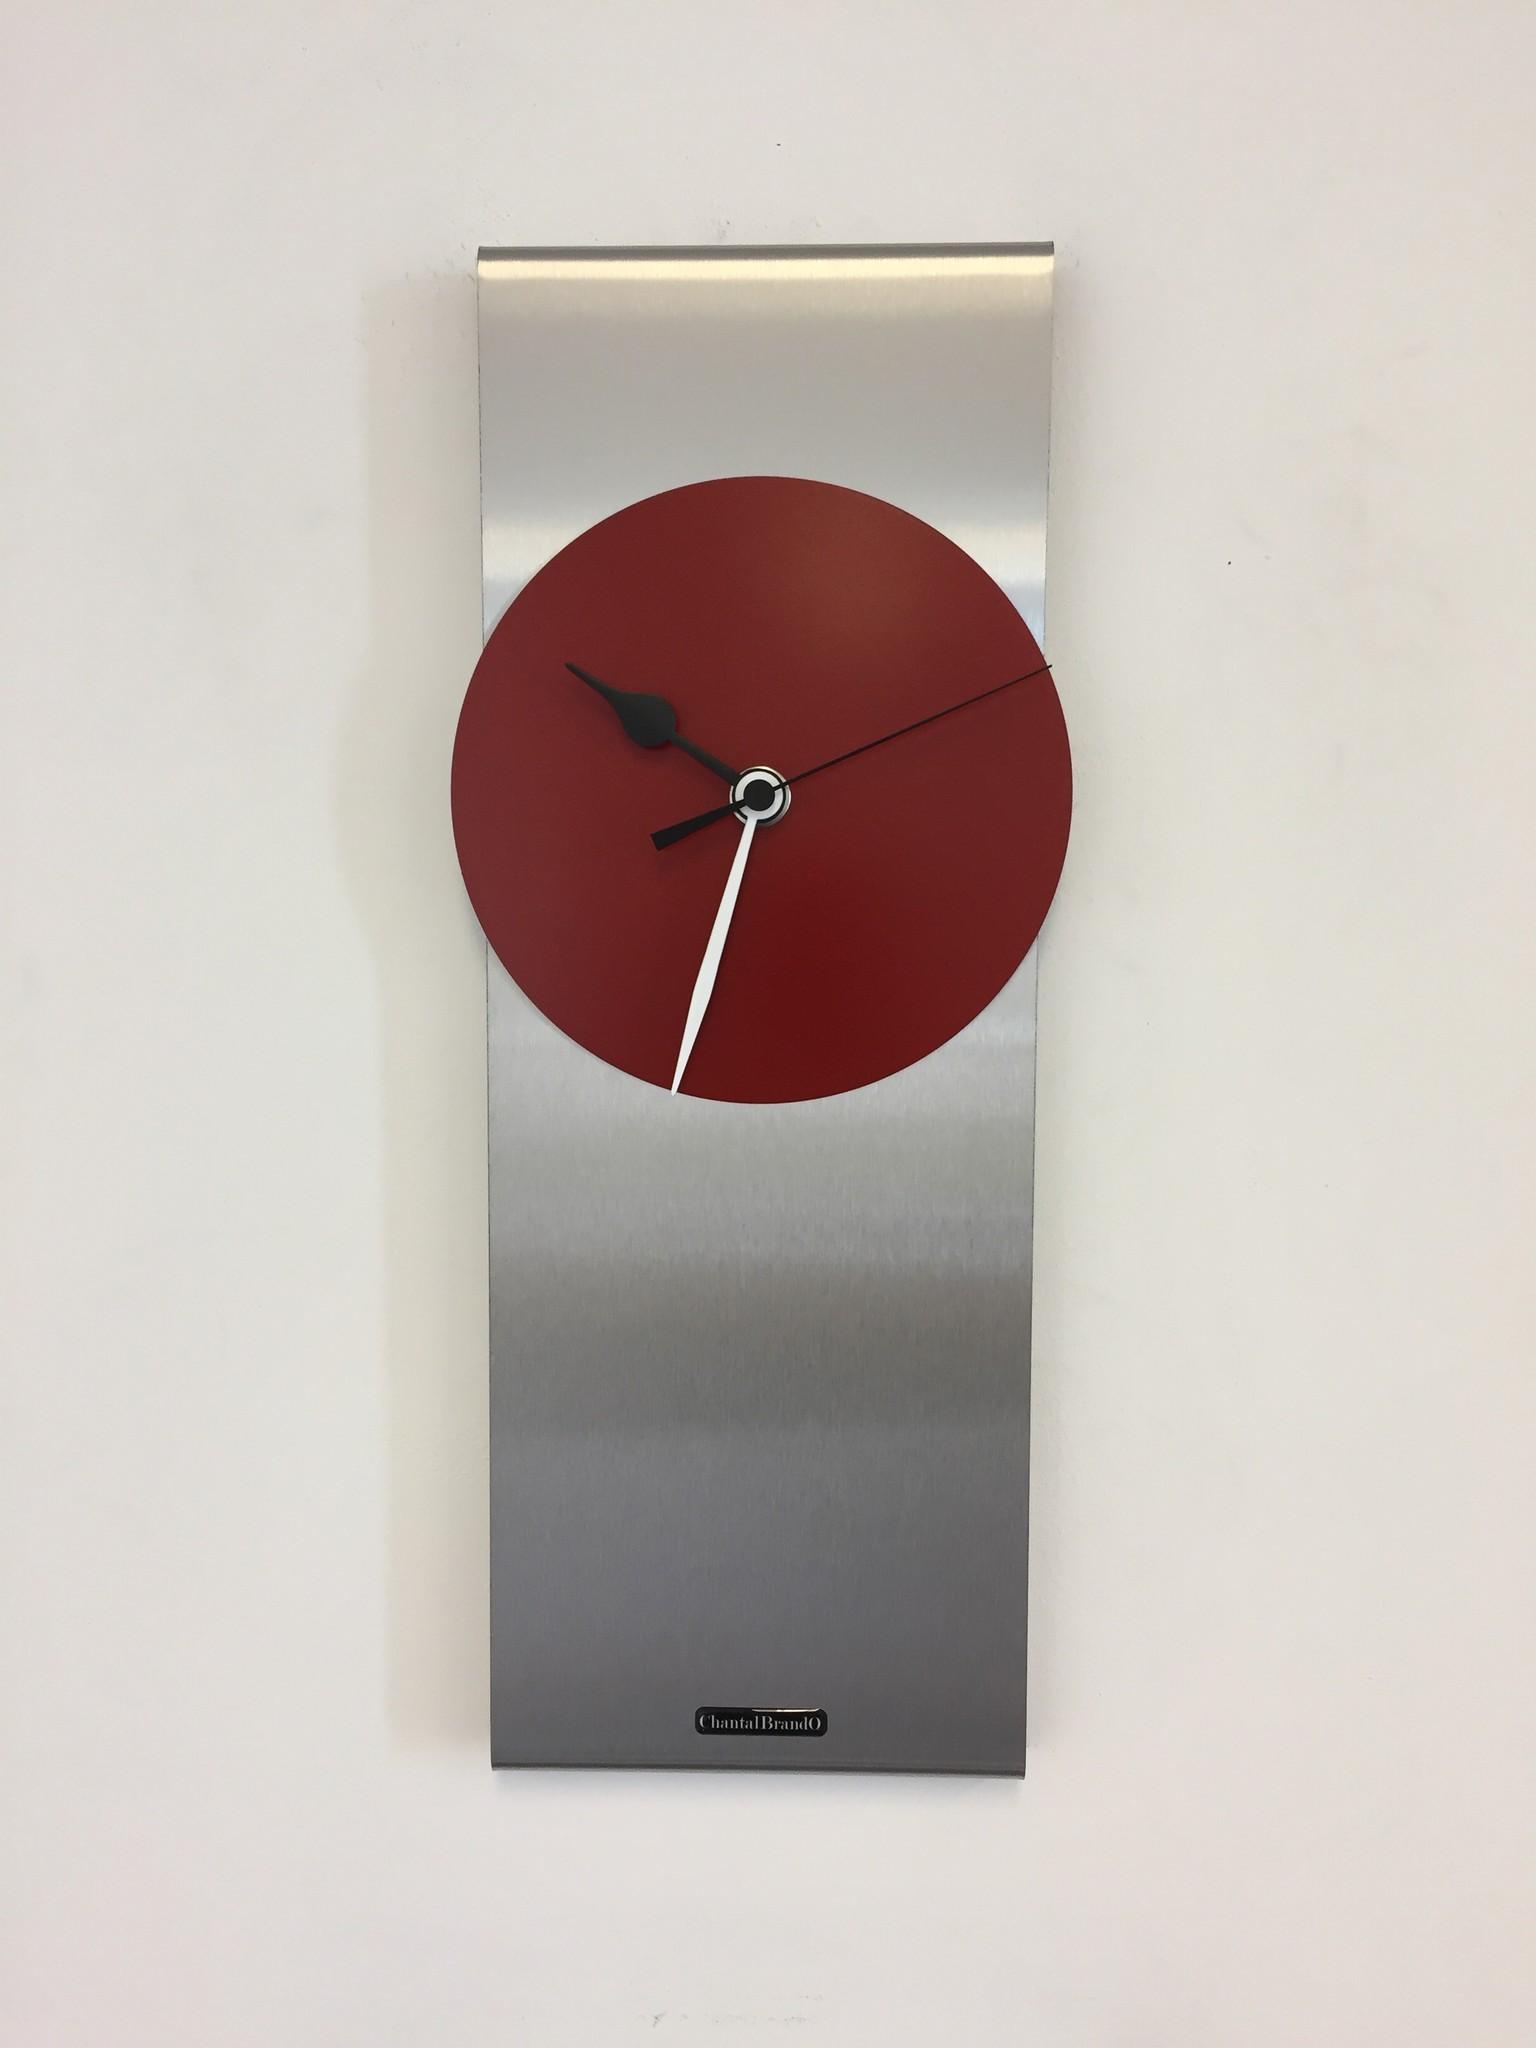 ChantalBrandO Wandklok ORION RED B&W Modern Dutch Design